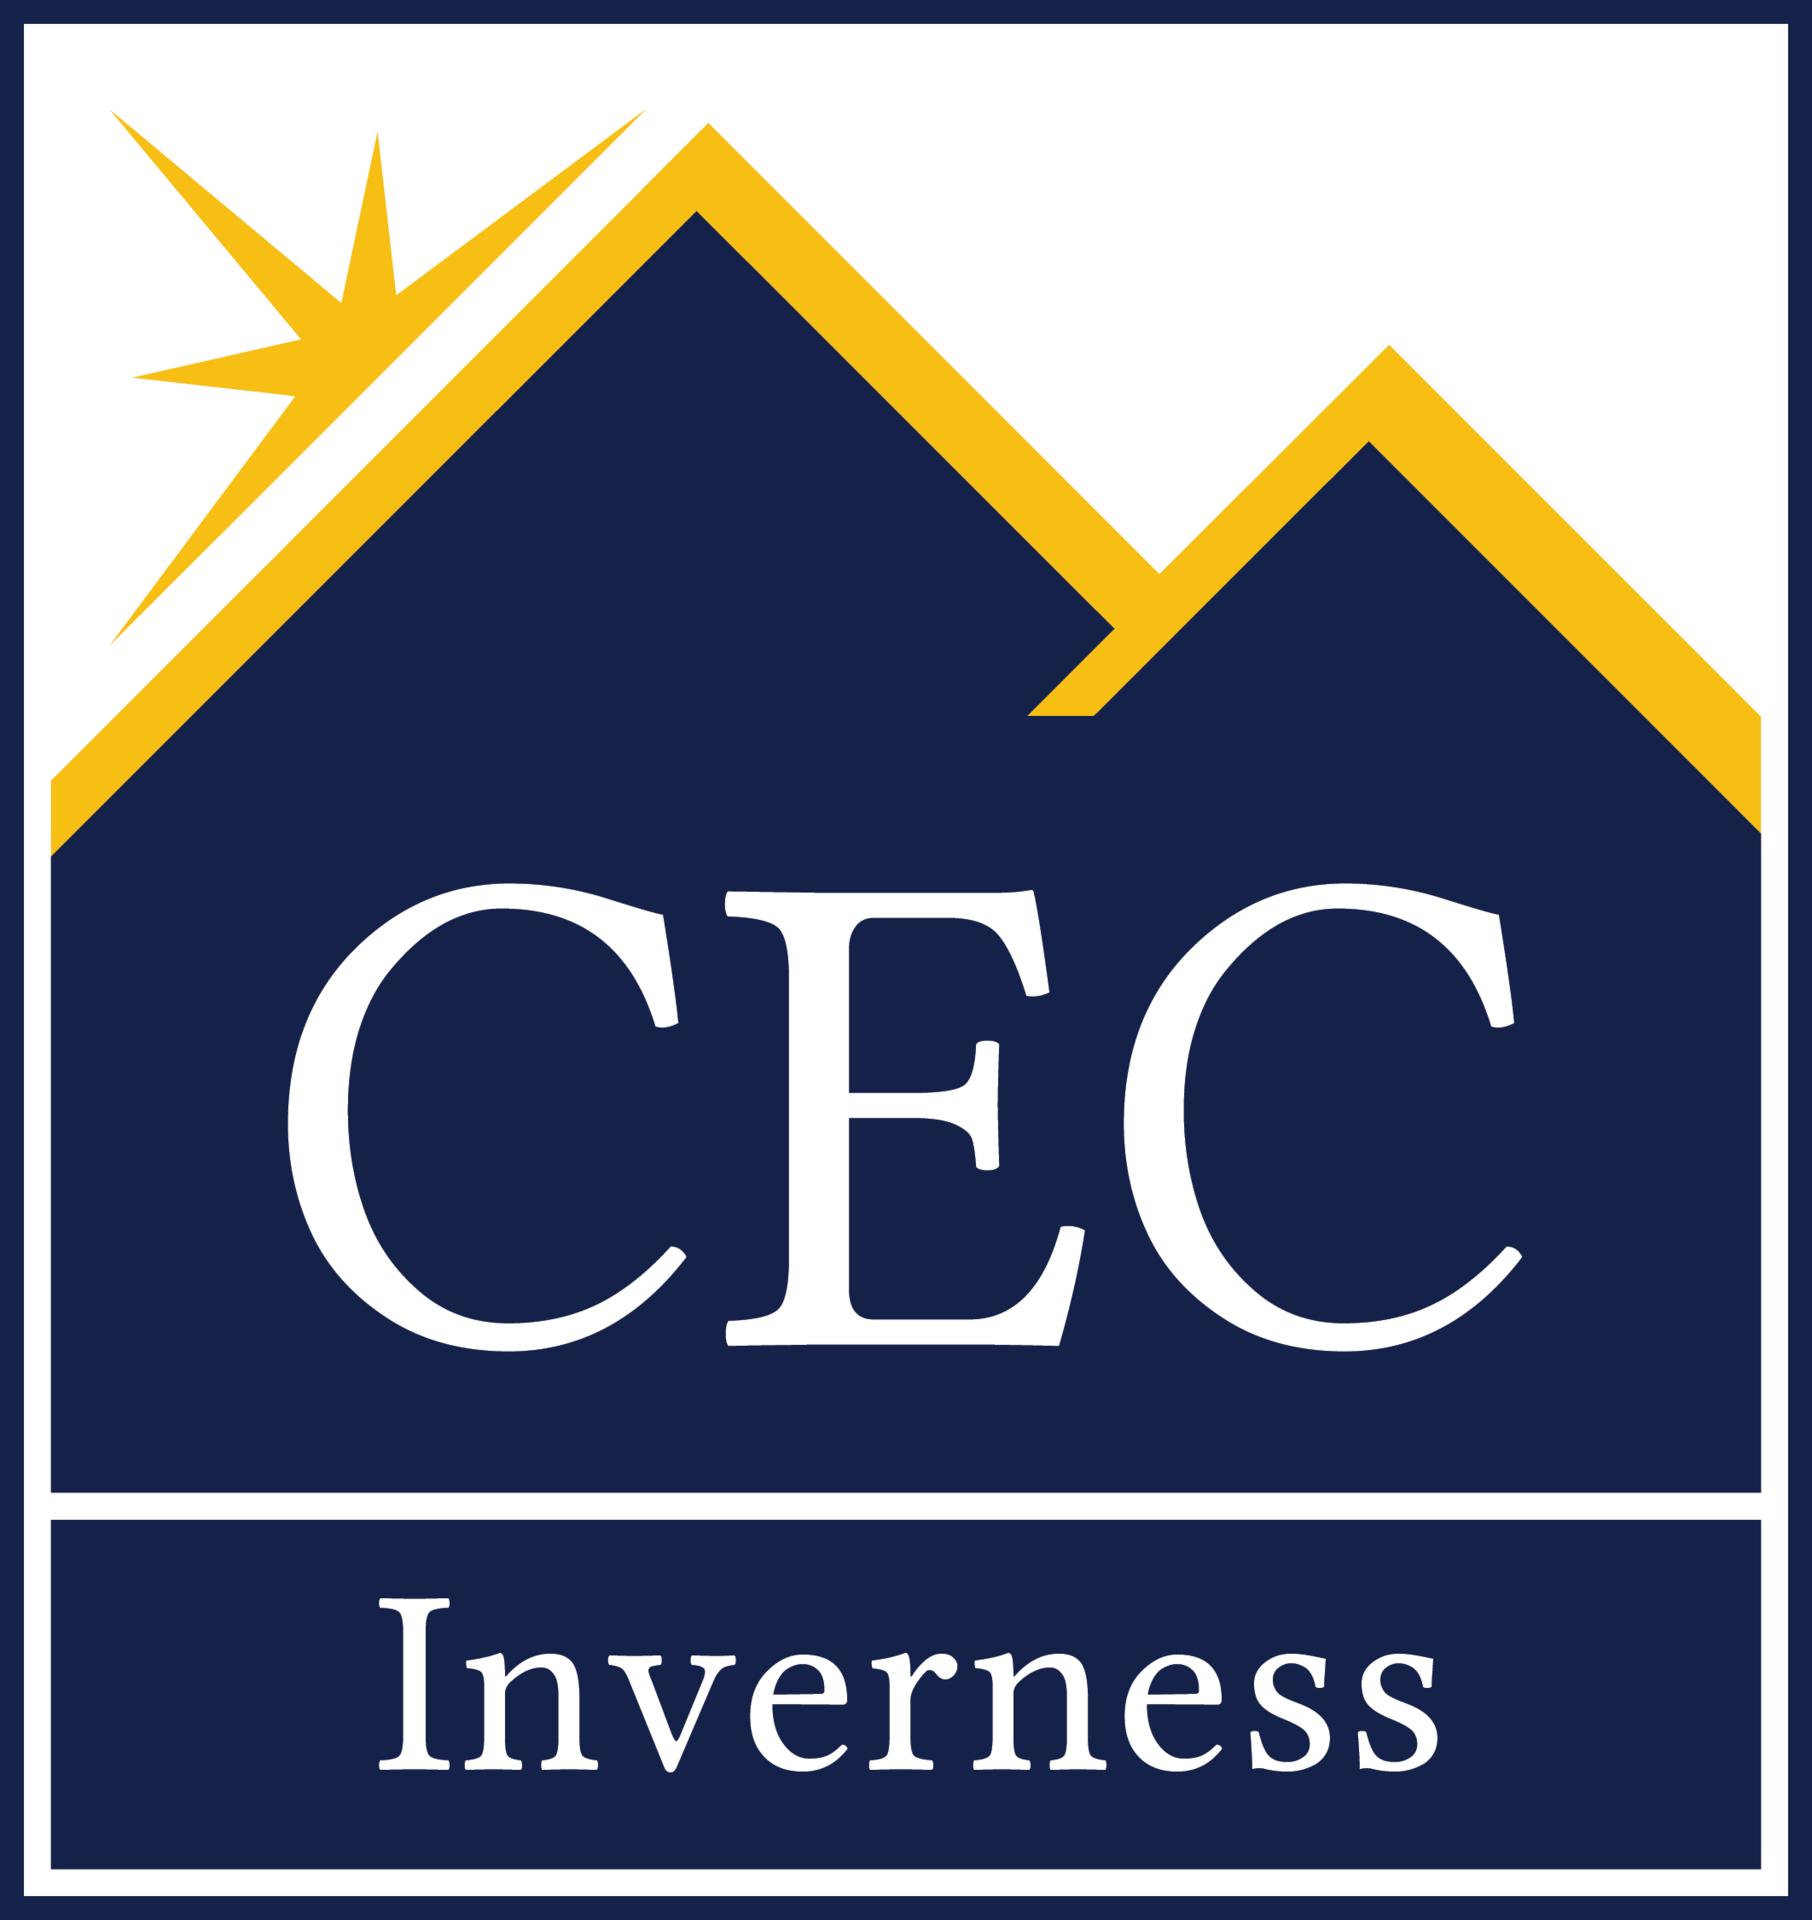 Inverness logo